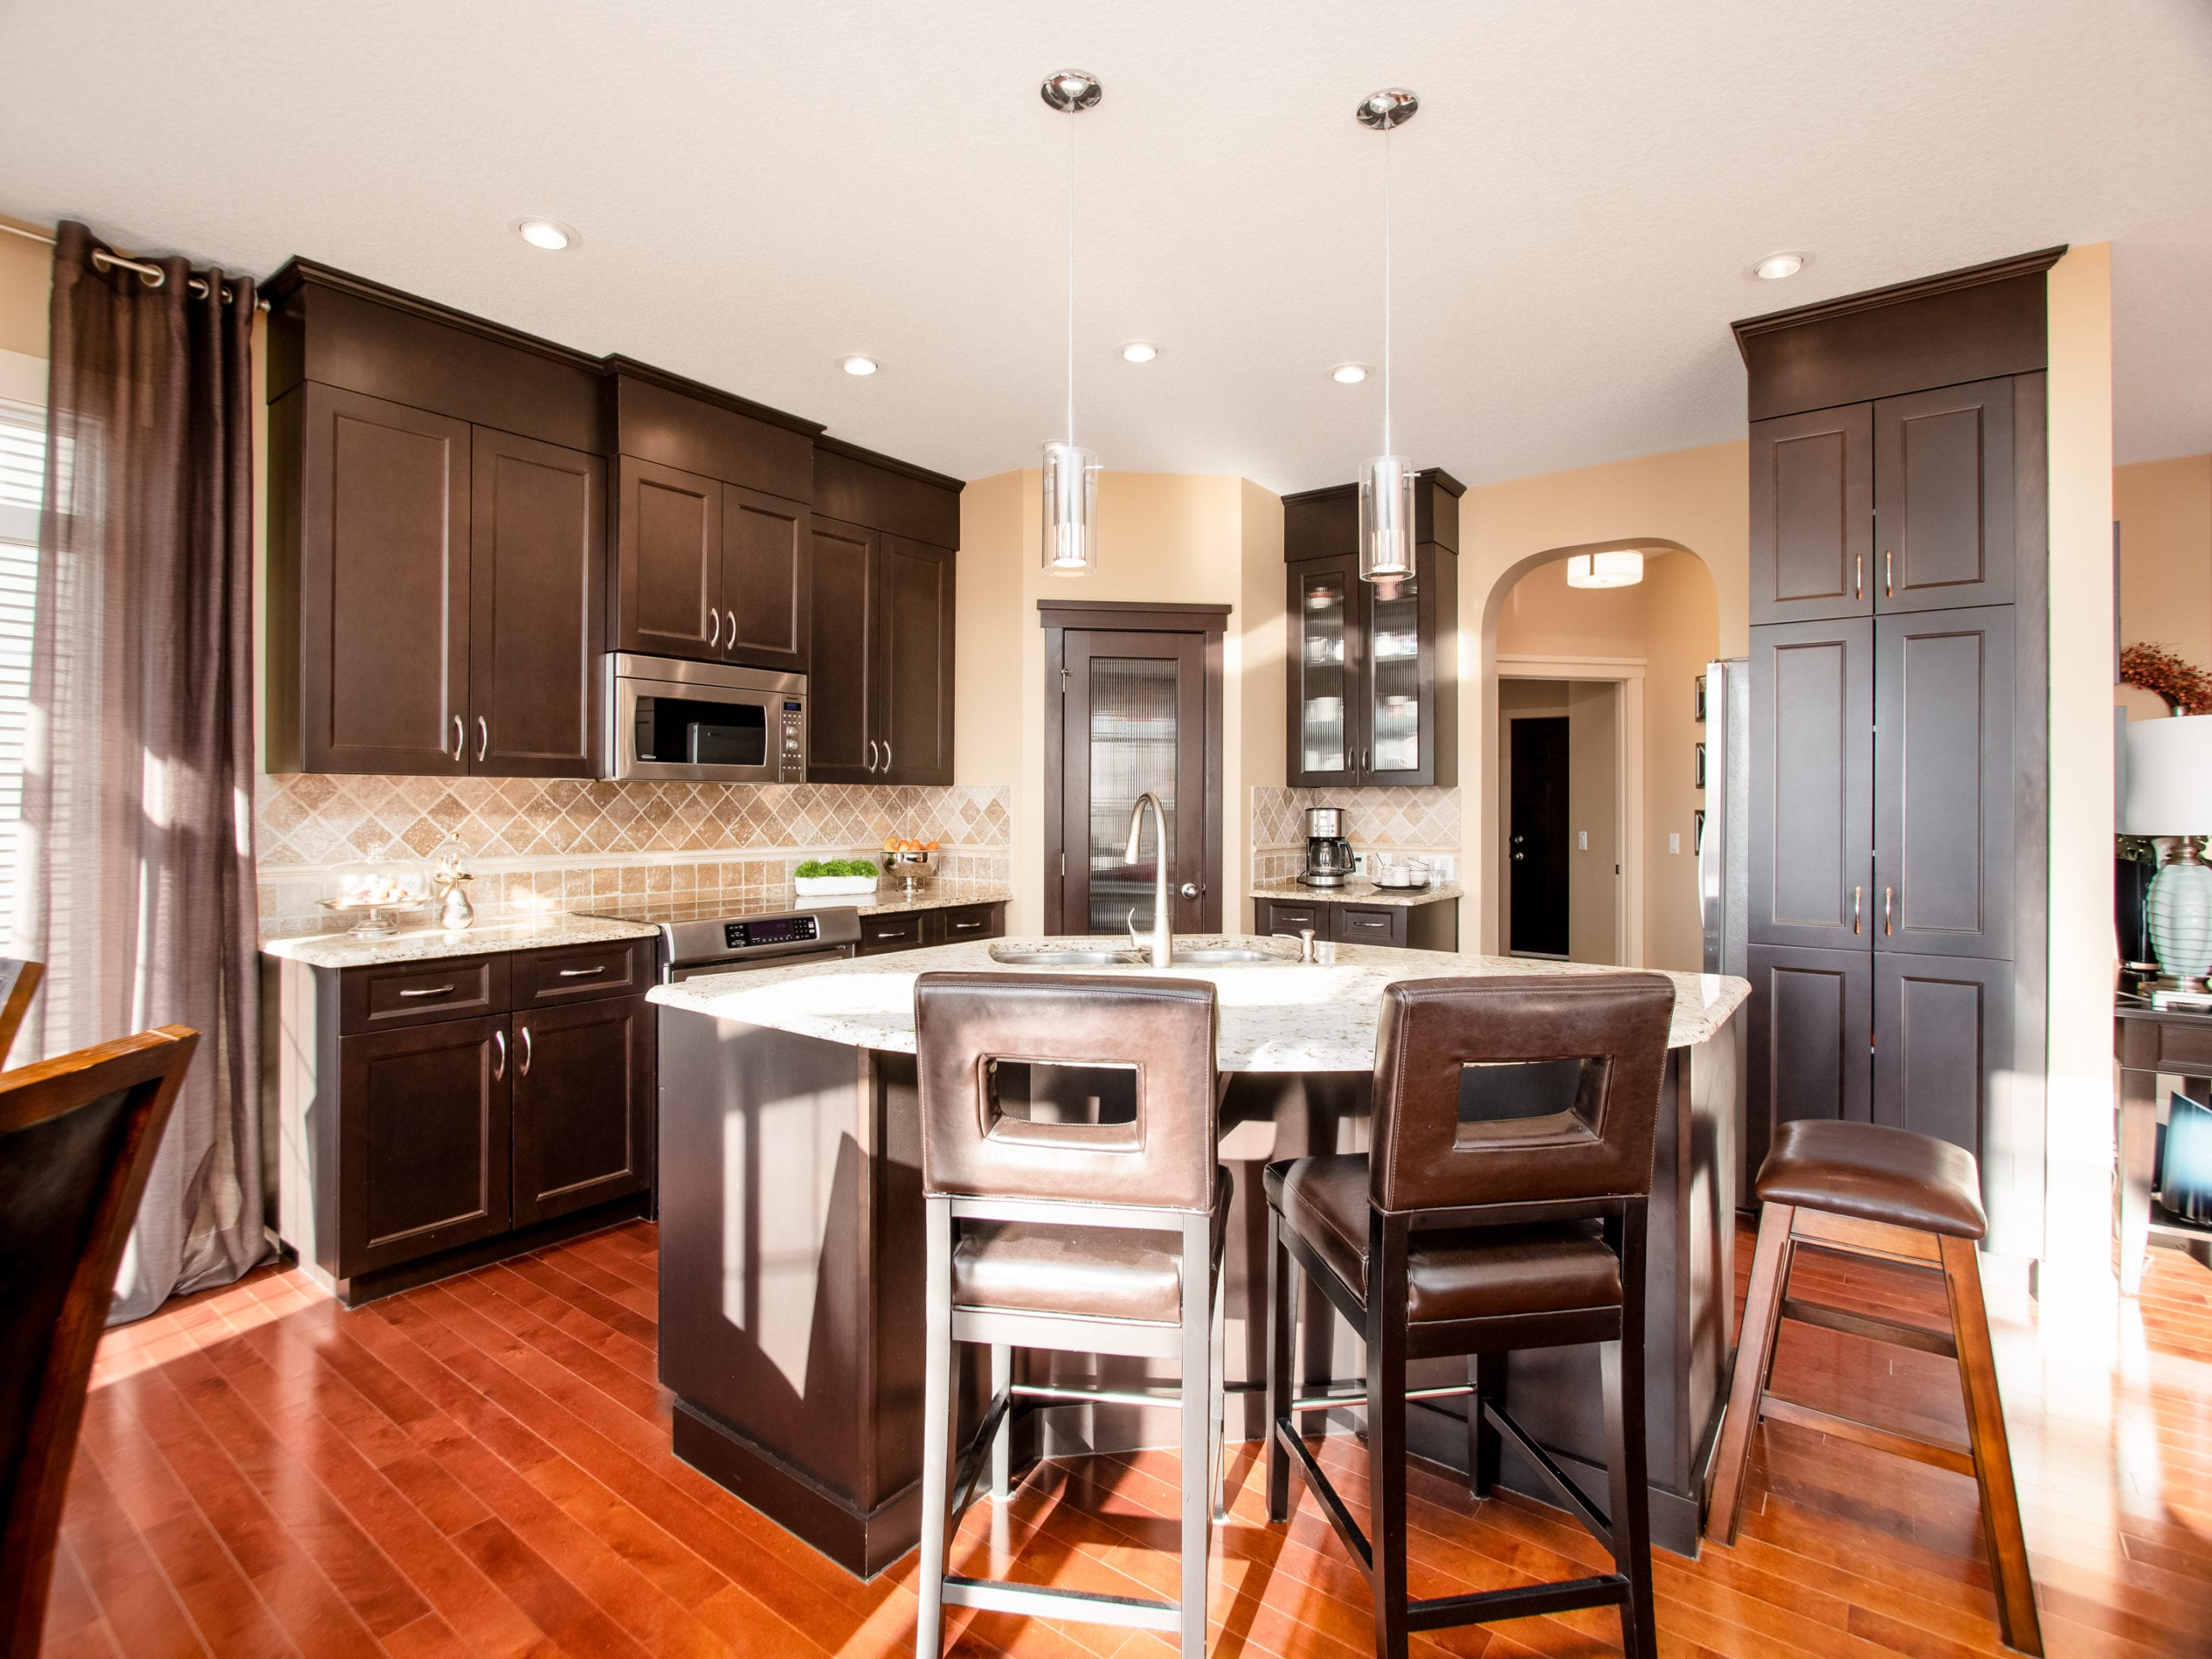 Hello Gorgeous - 131 Sage Valley Green NW Calgary AB - Tara Molina Real Estate (13 of 54)